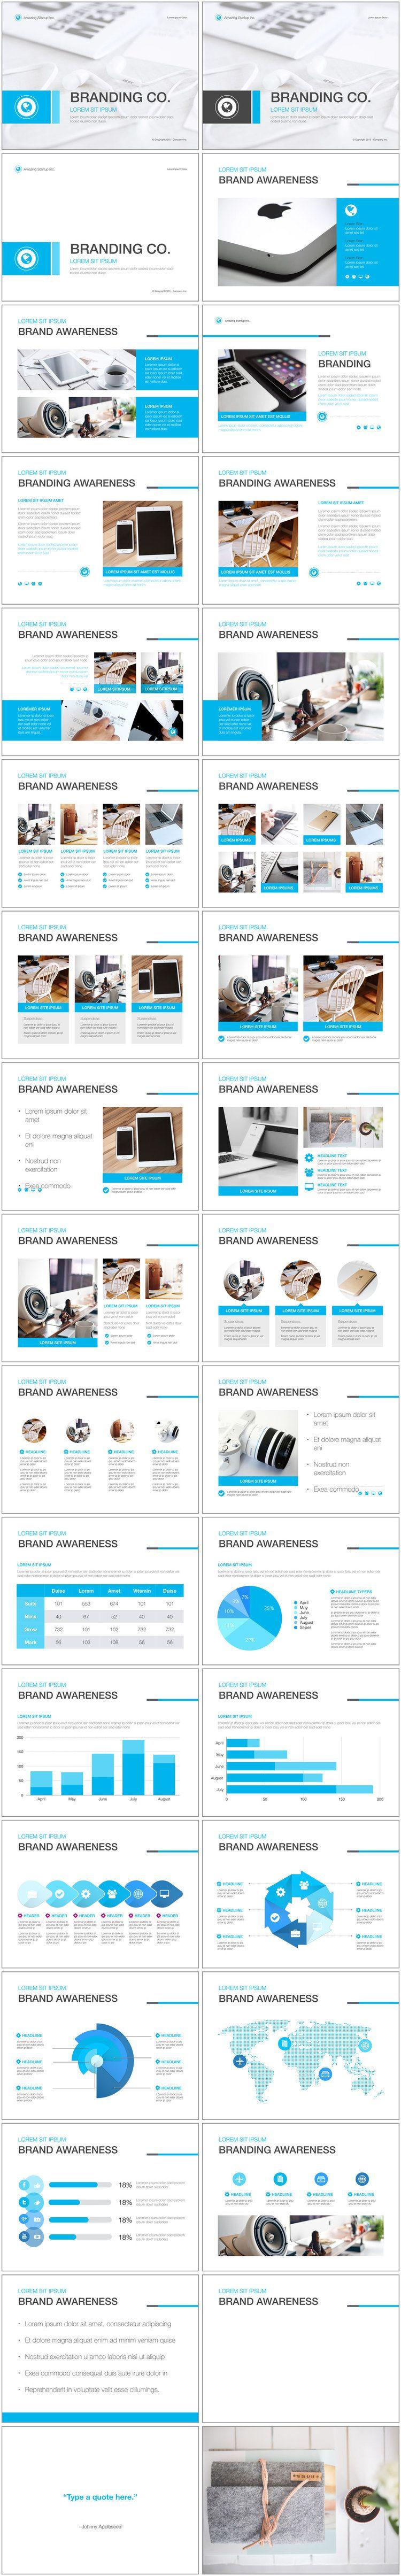 branding keynote keynote authors and template. Black Bedroom Furniture Sets. Home Design Ideas